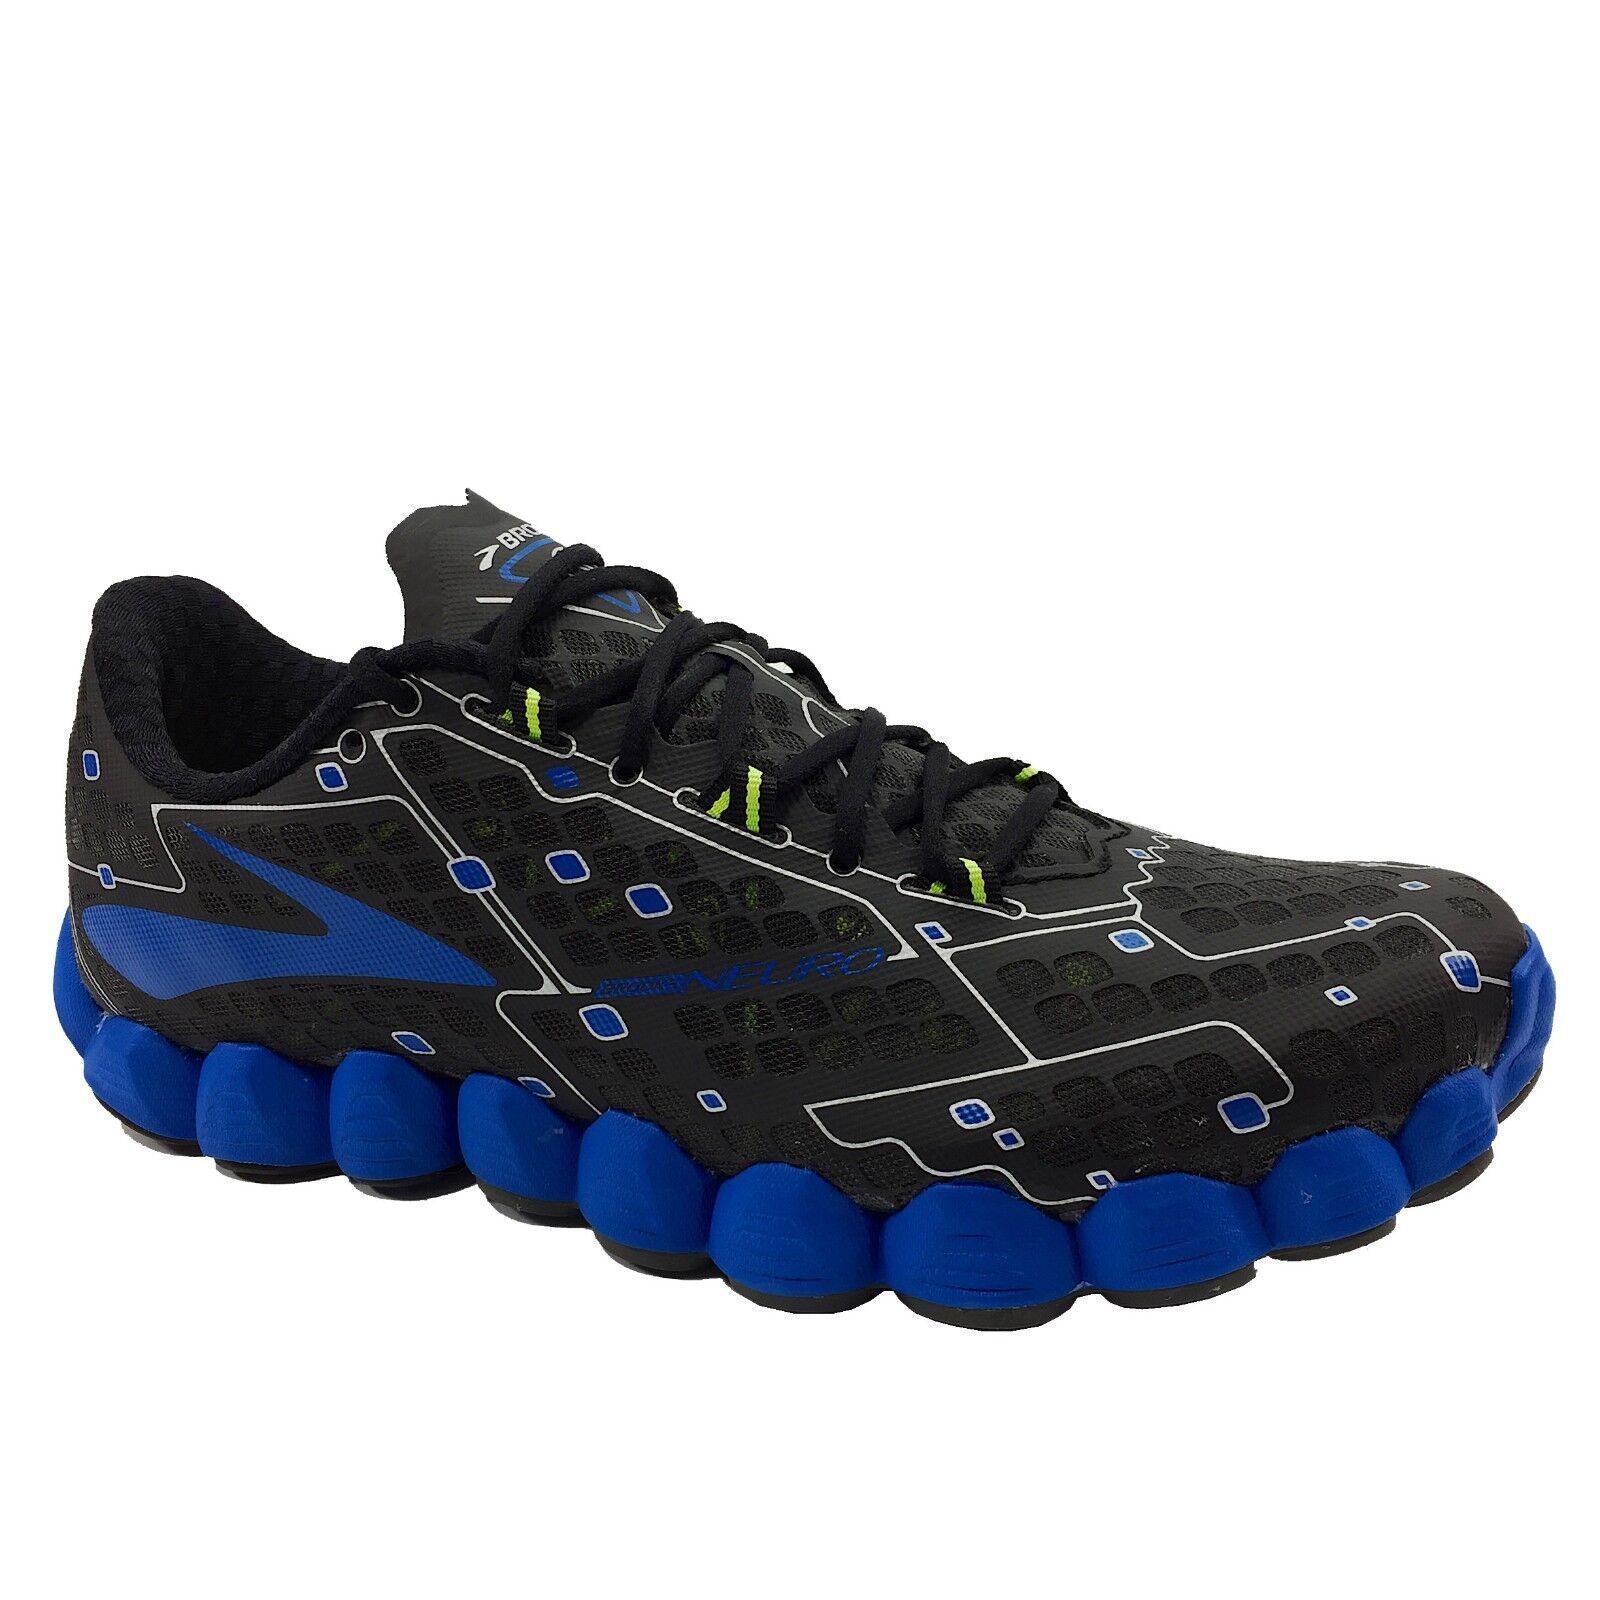 nyA Brooks NEURO herr springaning skor Sz 10, 11.5 11.5 11.5 Metallic Charkole Electric blå  leverans kvalitet produkt